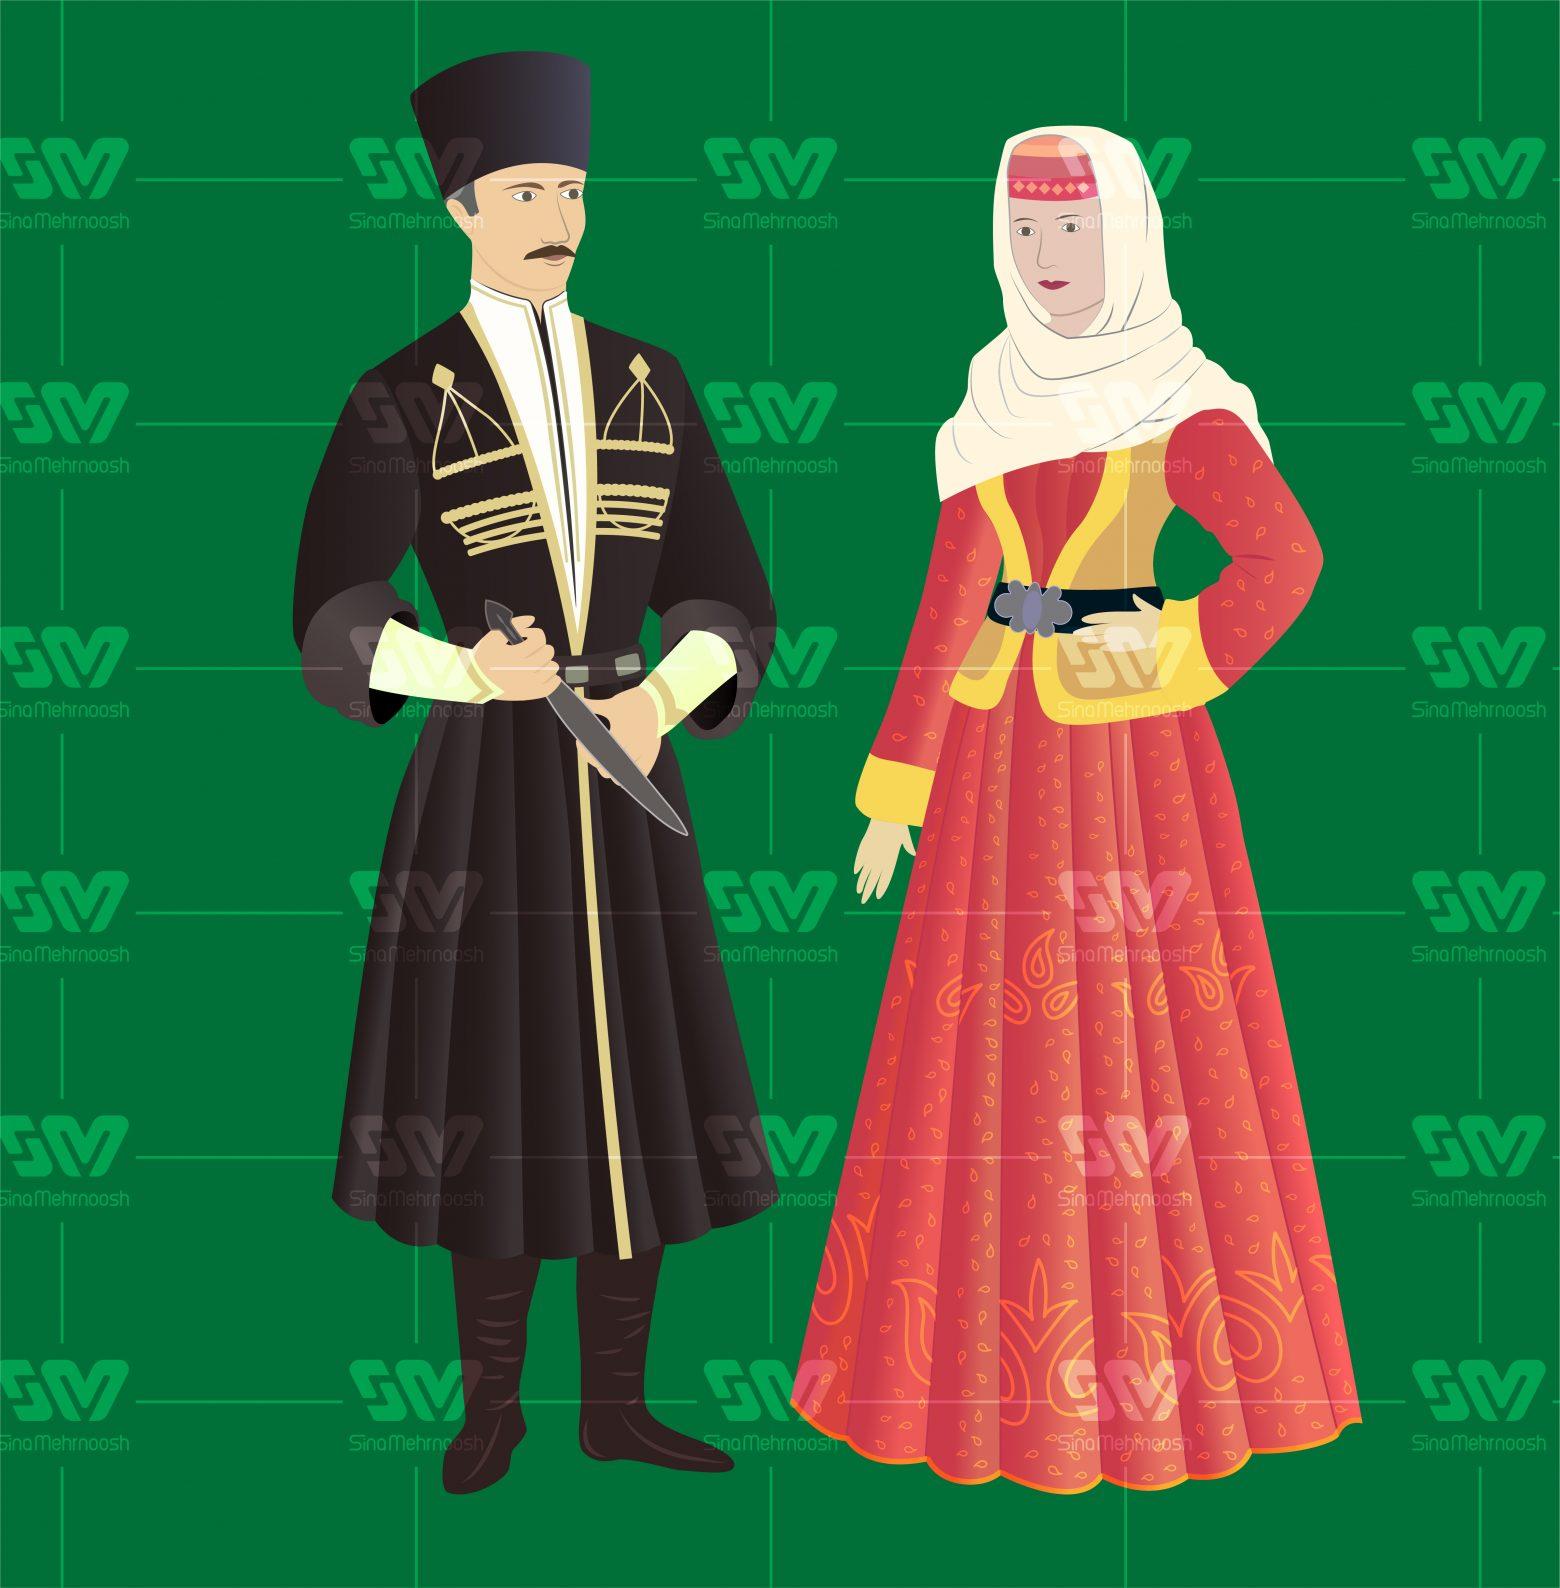 1لباس ترکی 01 1560x1588 - وکتور لباس محلی اقوام ایرانی